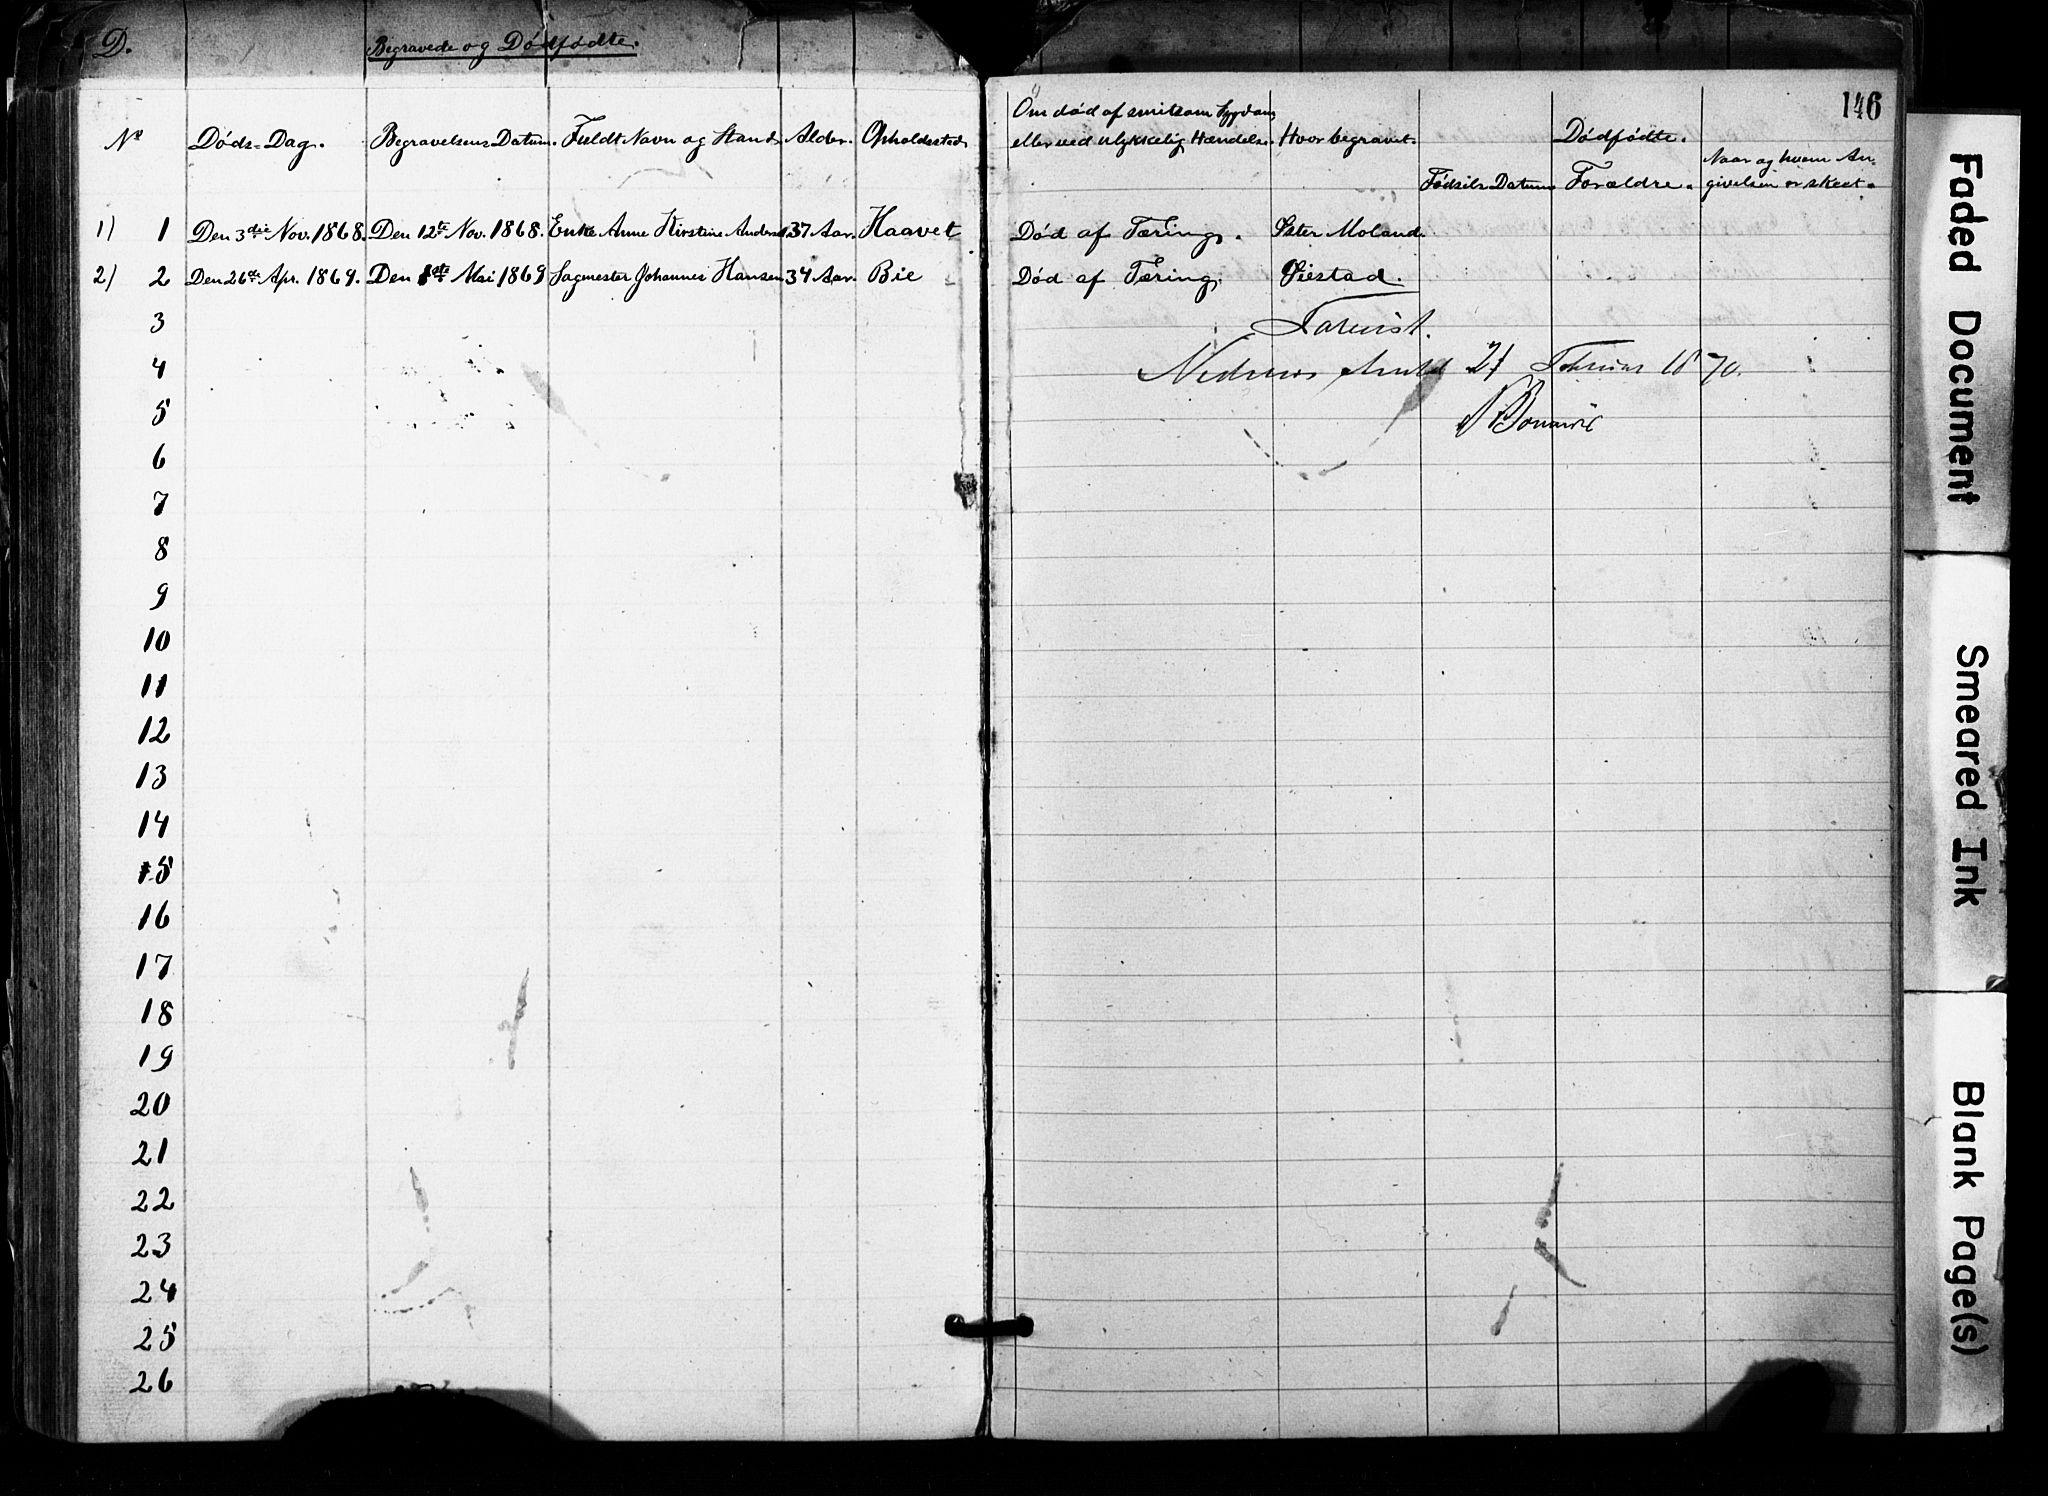 SAK, Metodistmenigheten, Arendal, F/Fa/L0001: Dissenterprotokoll nr. F-2, 1867-1879, s. 146